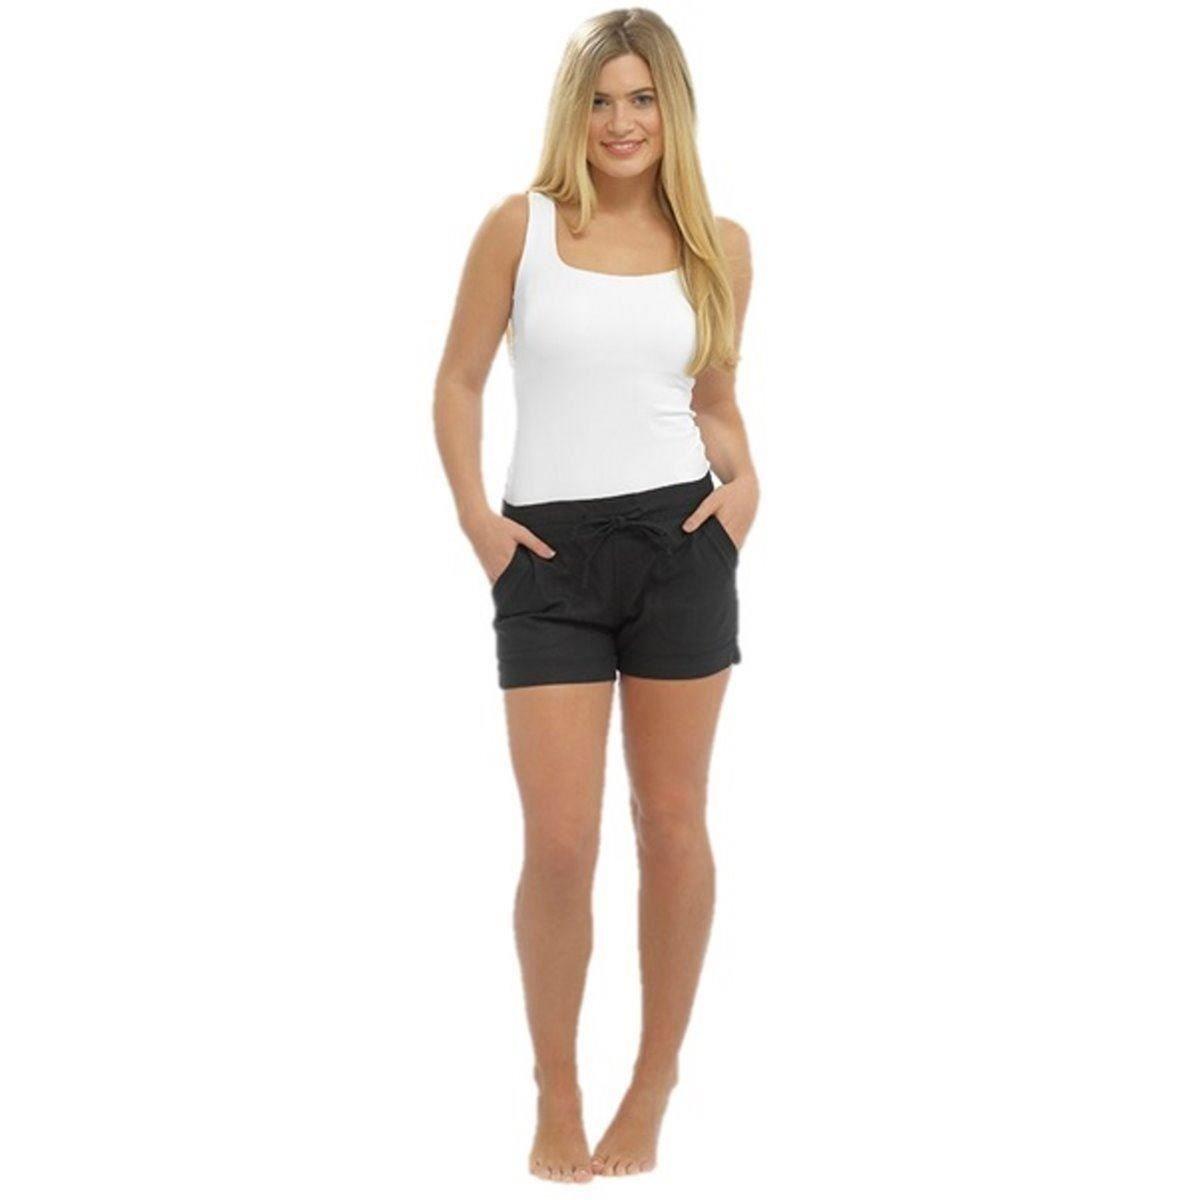 24c6be4491ea09 armona Ladies Girls Linen Shorts Beach Summer Holiday Pants at ...